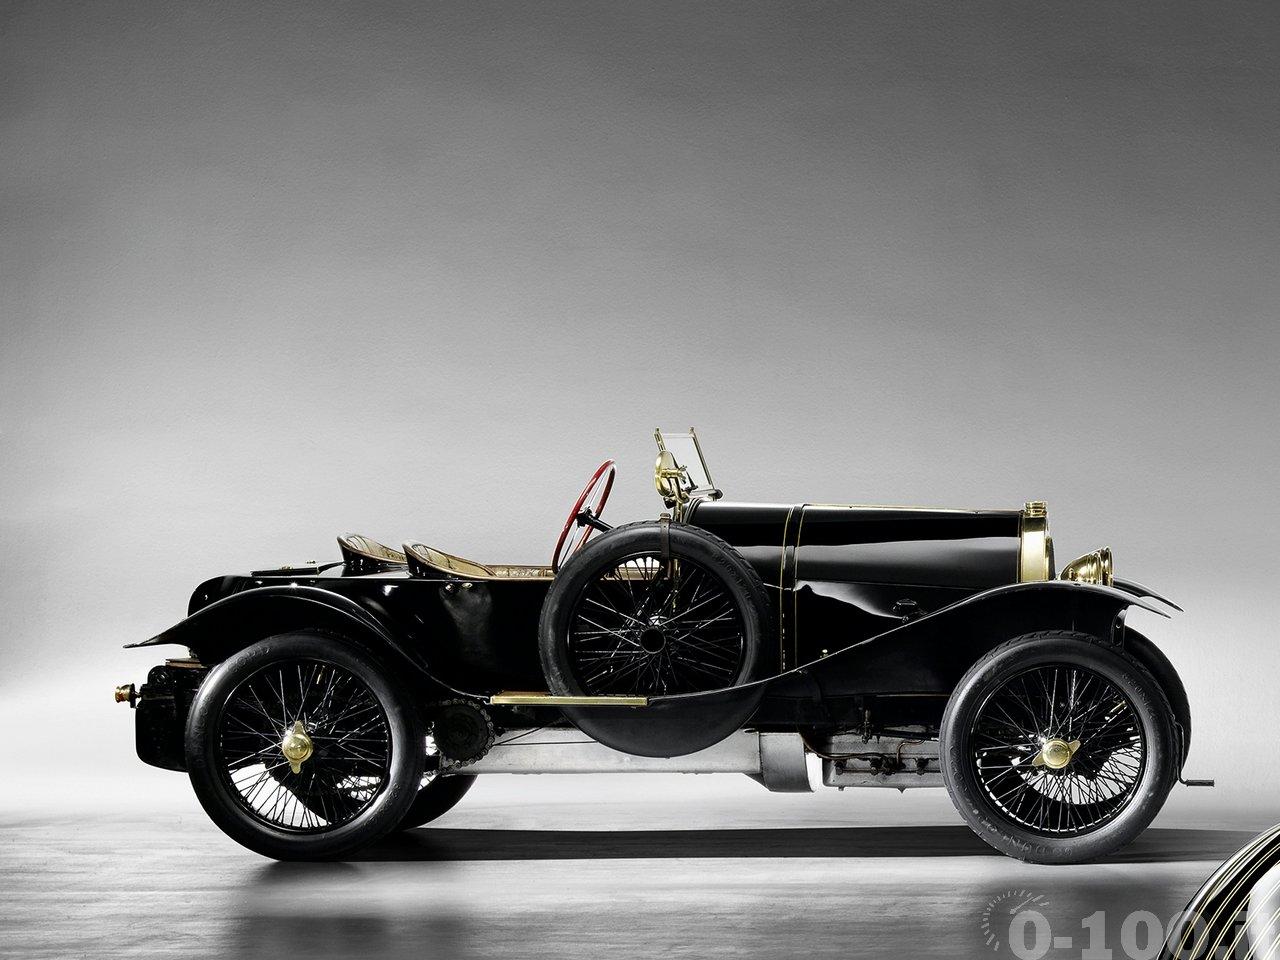 beijing-2014-bugatti-veyron-serie-speciale-les-legendes-de-bugatti-veyron-16-4-grand-sport-vitesse-black-bess_8